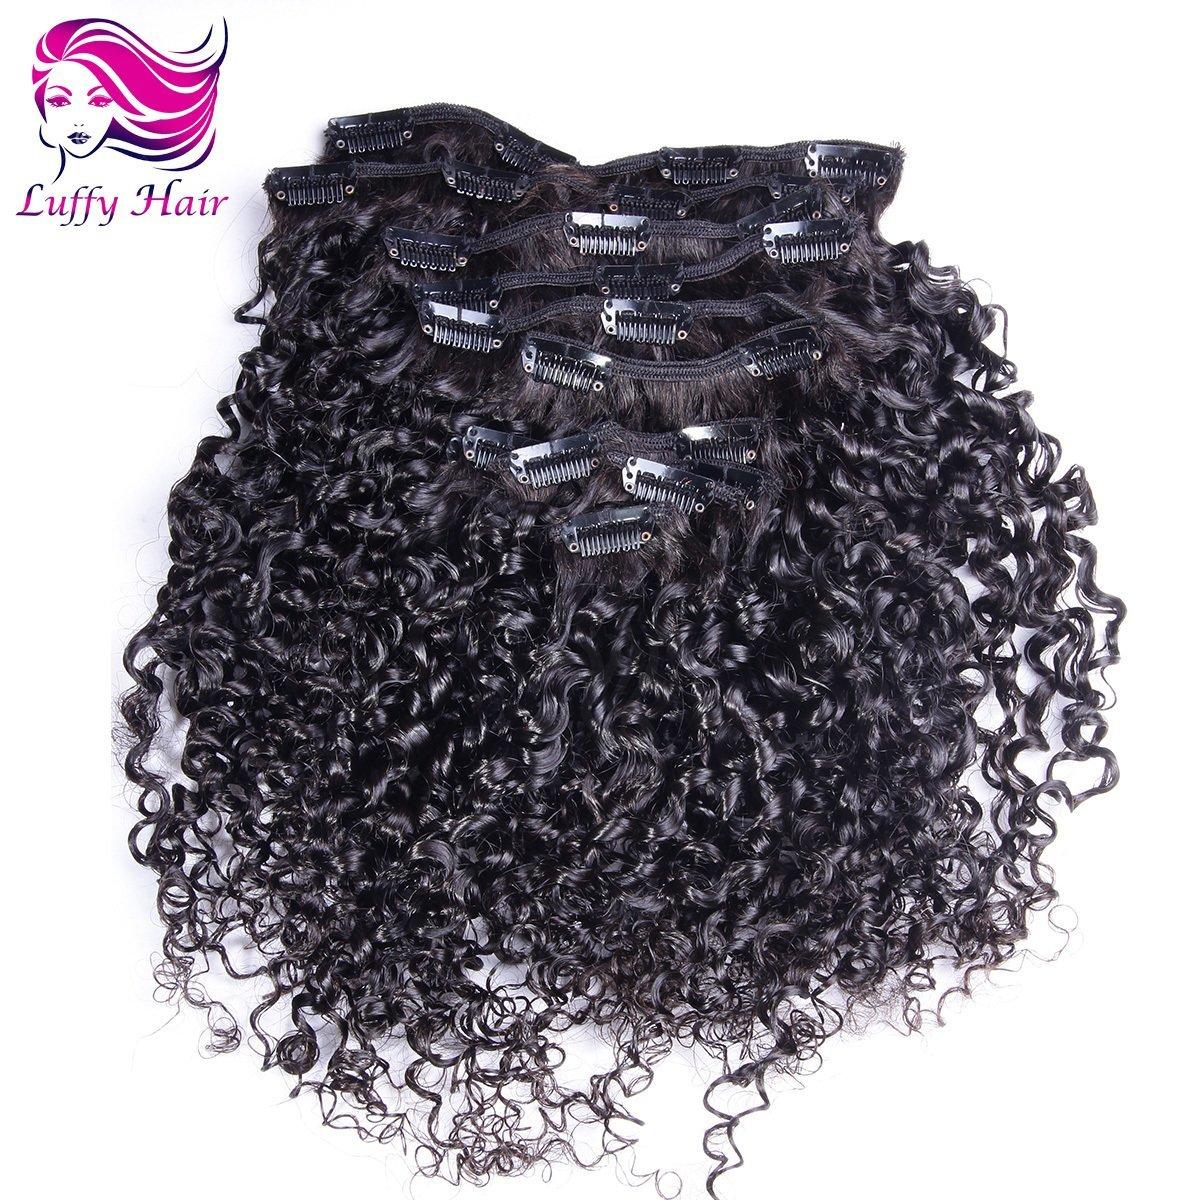 8A Virgin Human Hair Tight Curly Clip In Hair Extensions - KIL008